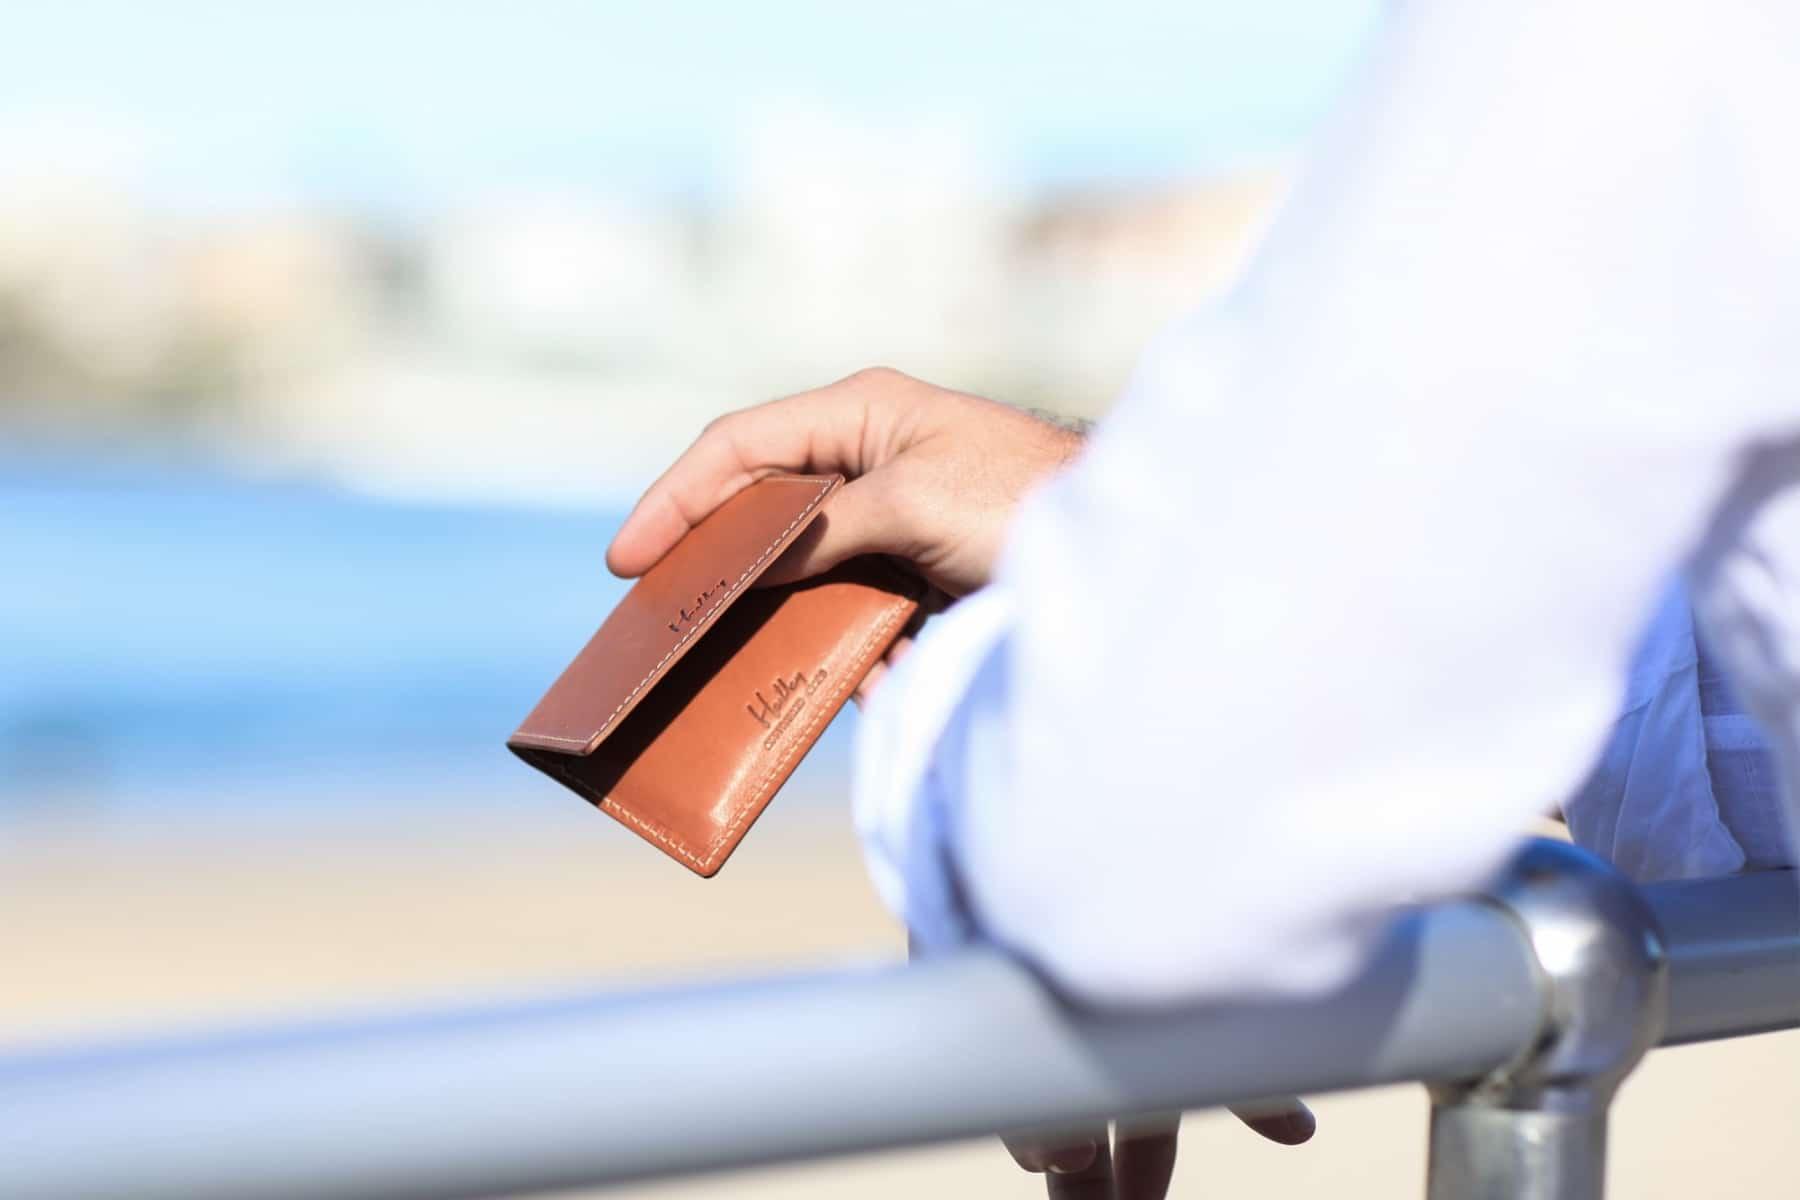 stylish minimalist kangaroo leather wallets